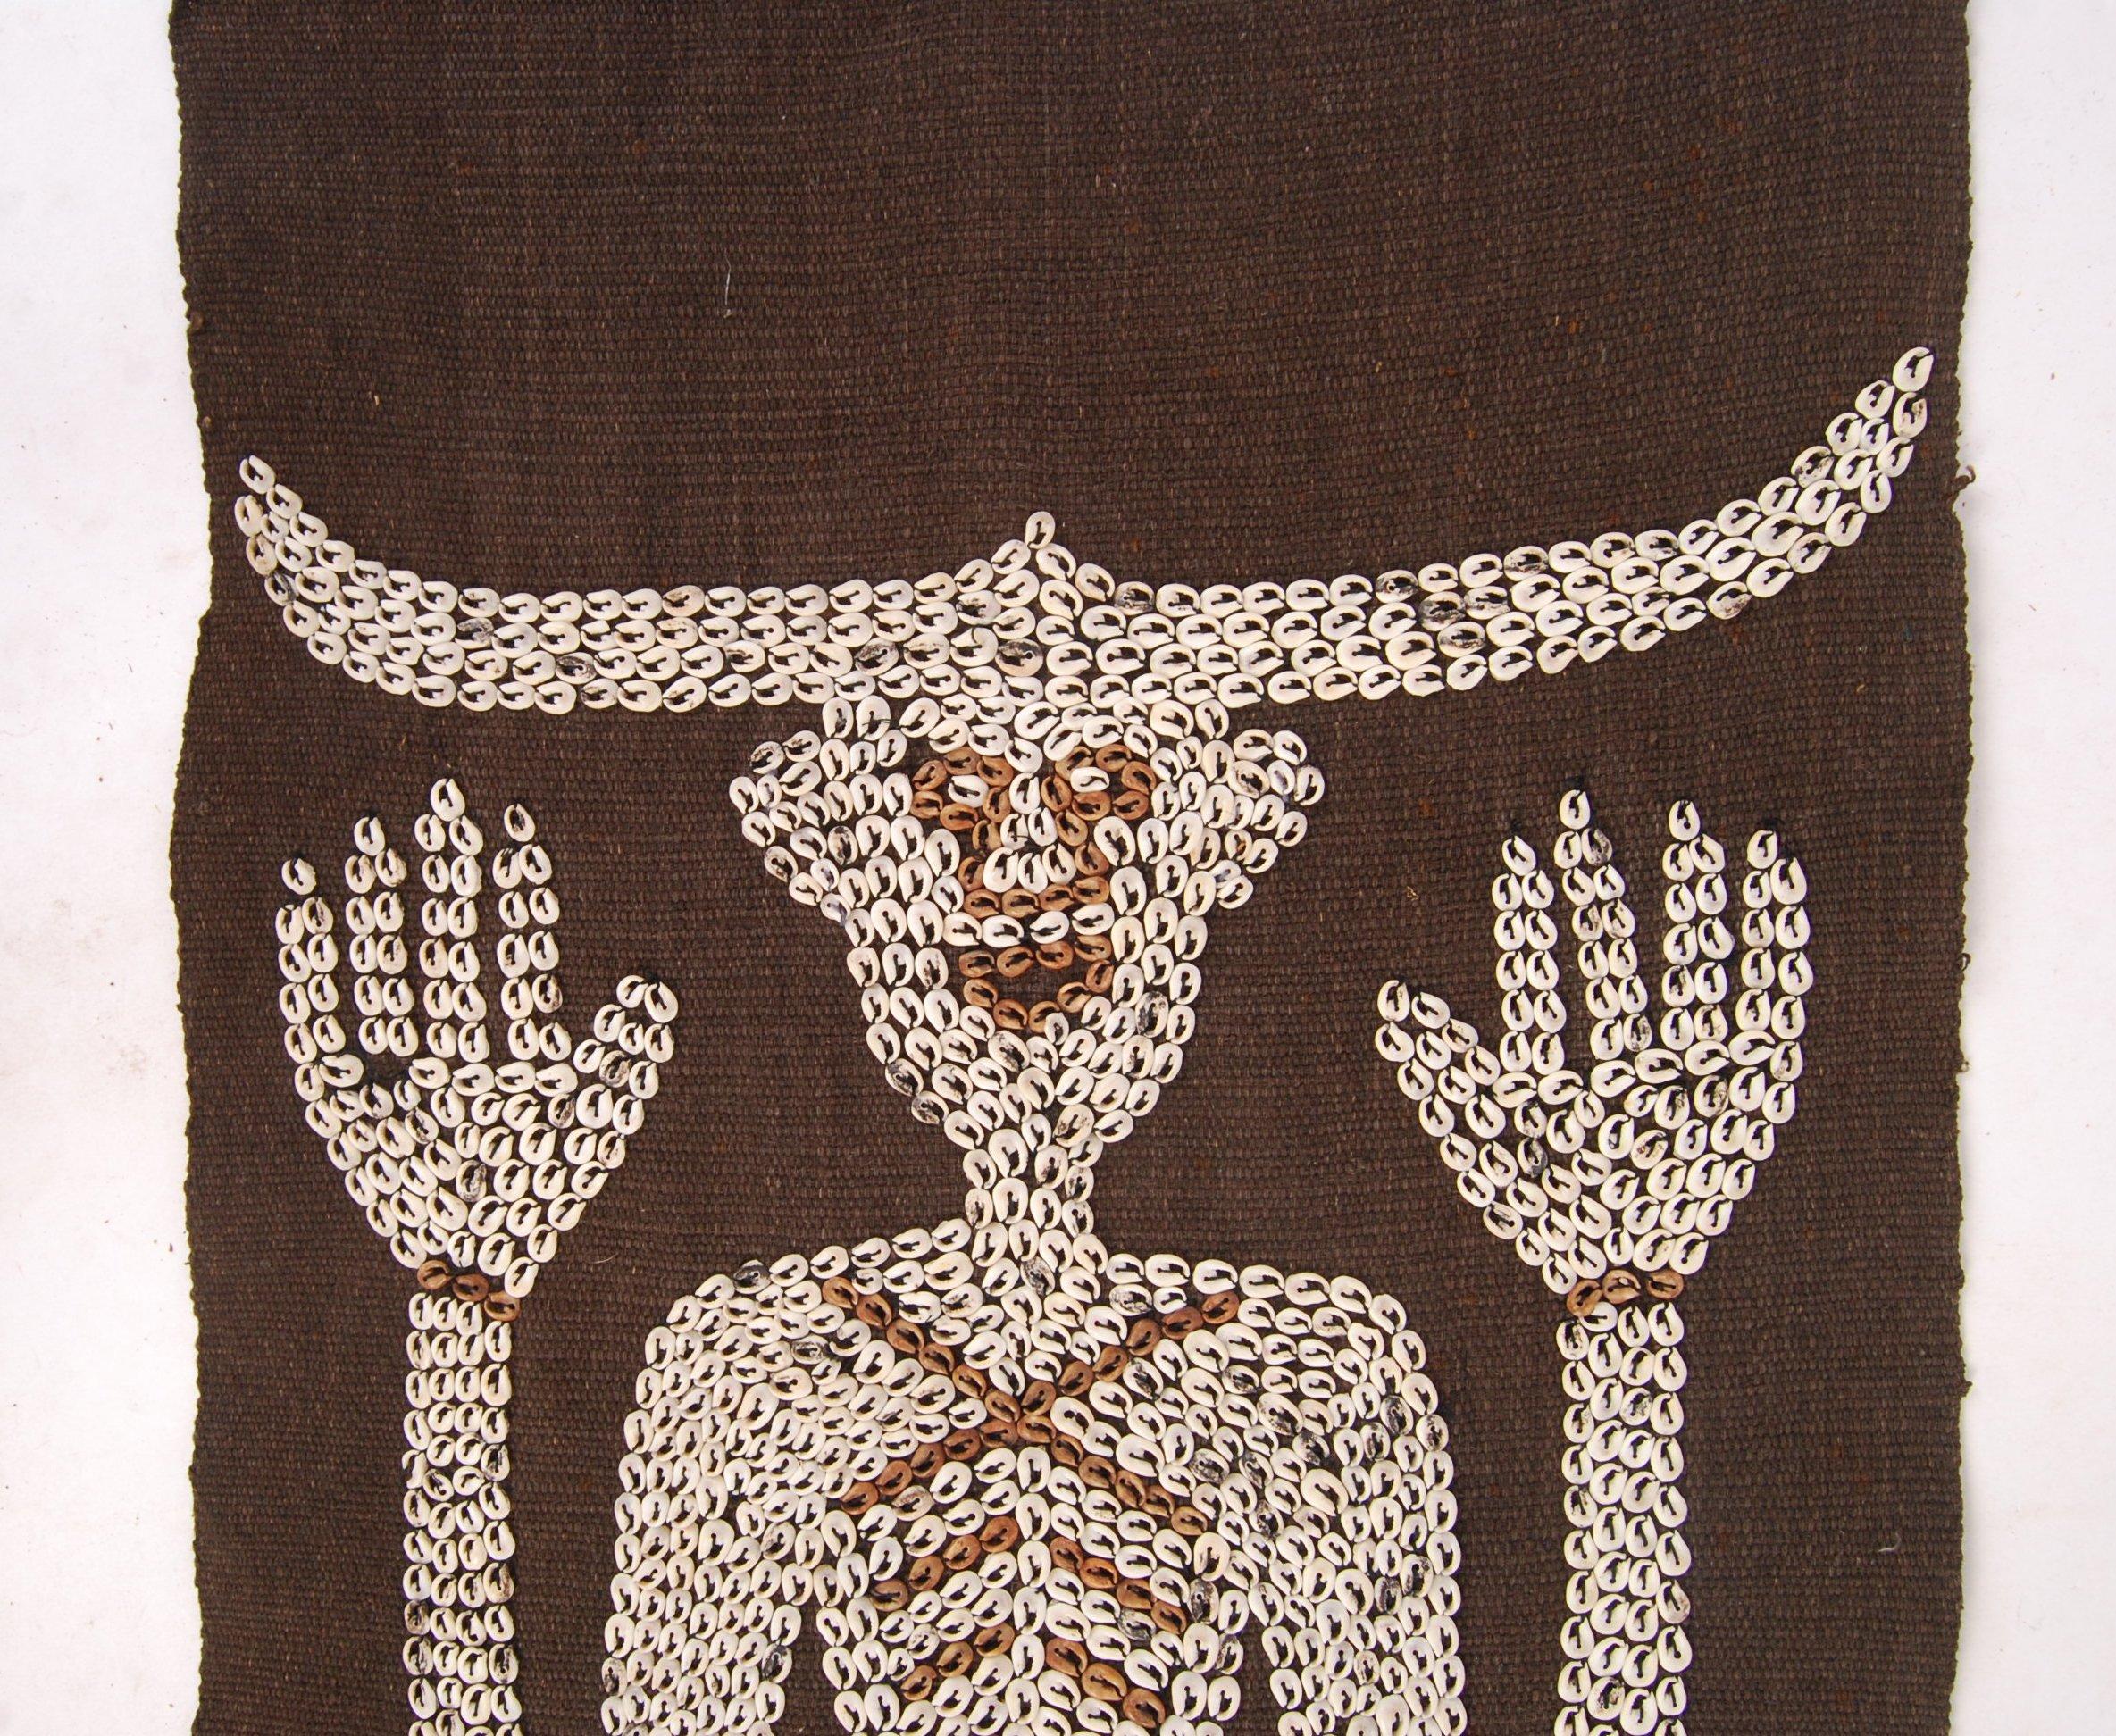 Lot 292 - 20TH CENTURY AFRICAN TRIBAL ART SHELL BEADED CLOTH